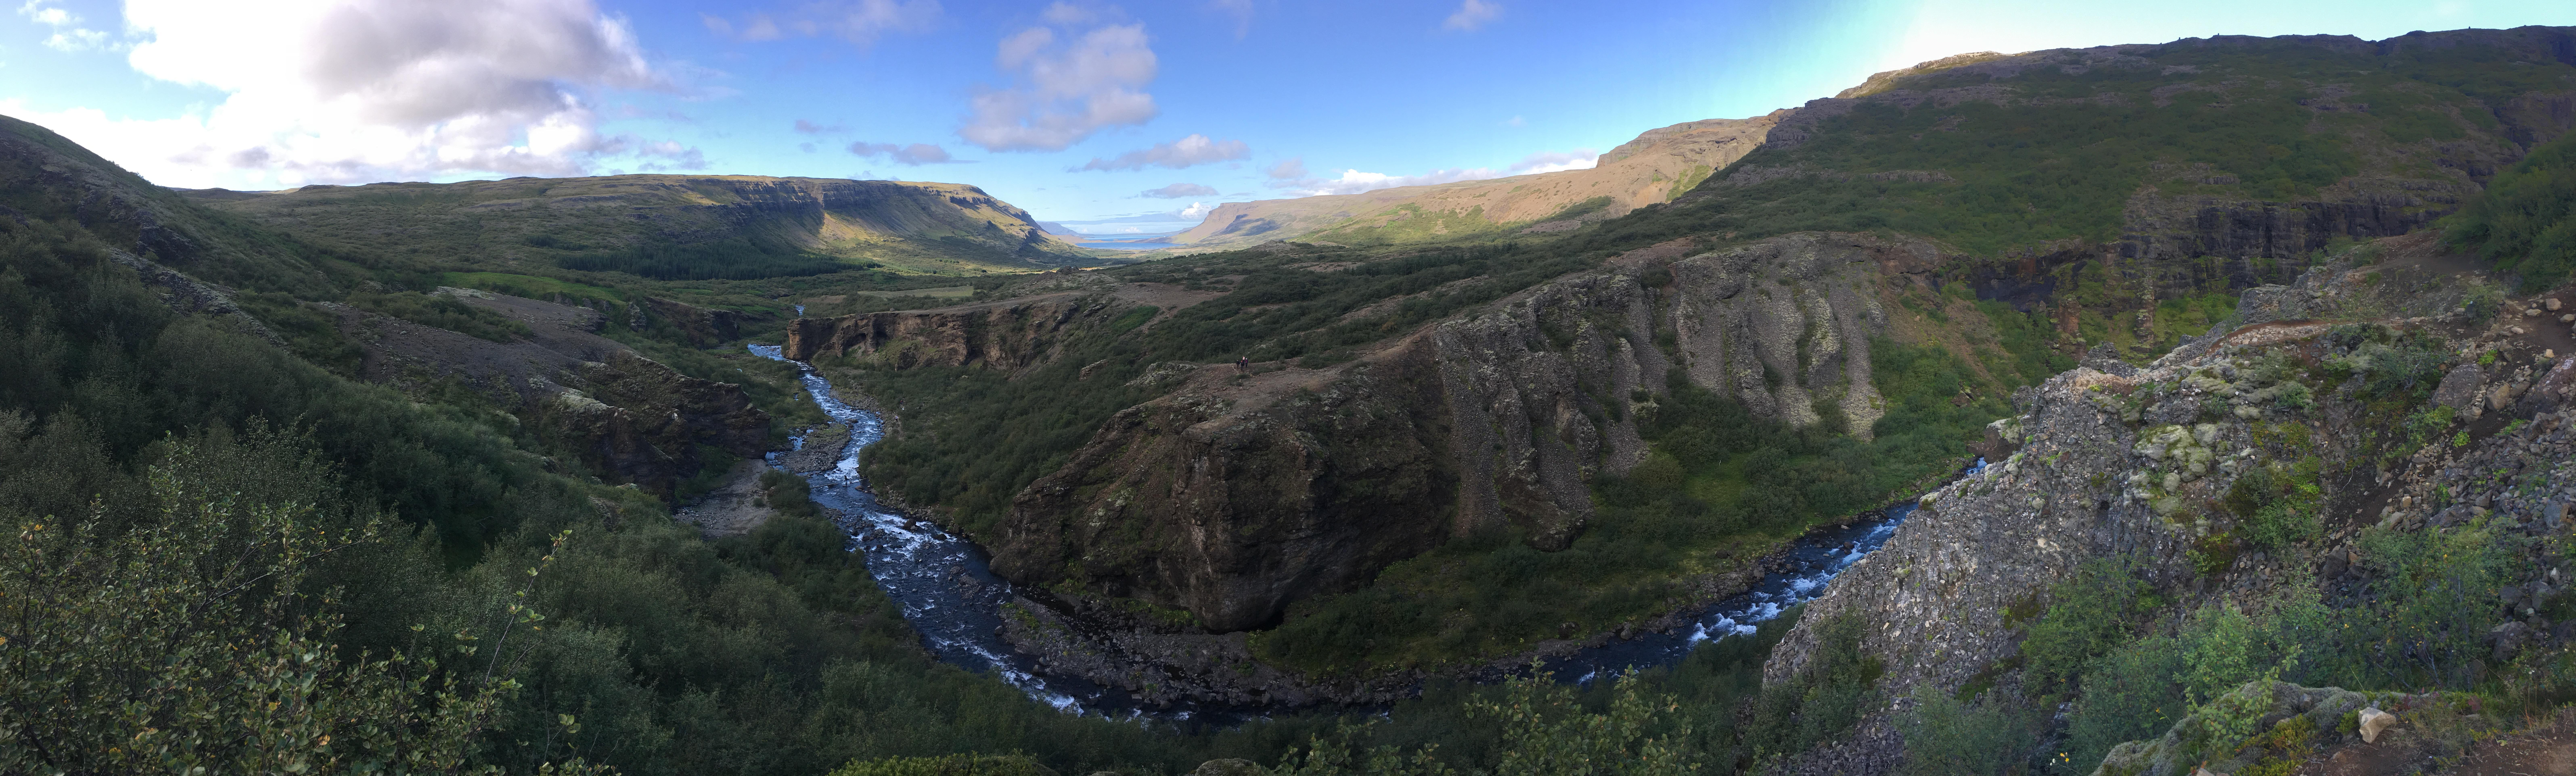 Panorama from Glymur Falls Trail Looking Back Towards Trailhead & Ocean